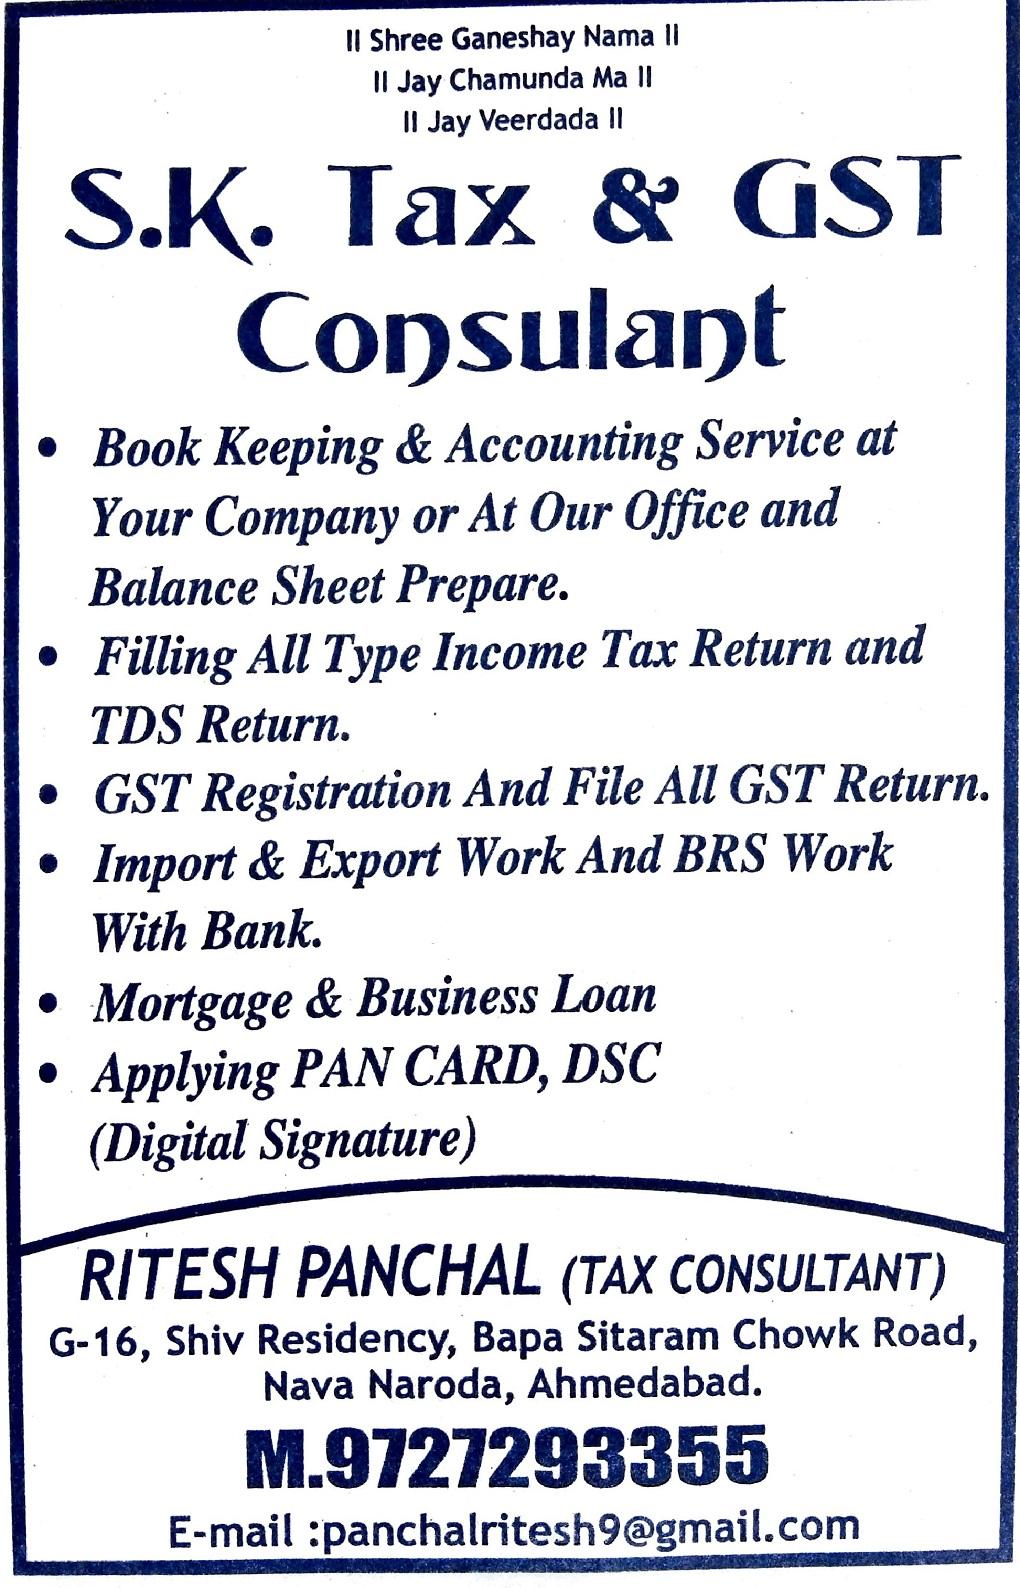 S.K. Tax & GST Consulant - 9727293355 Ritesh Panchal